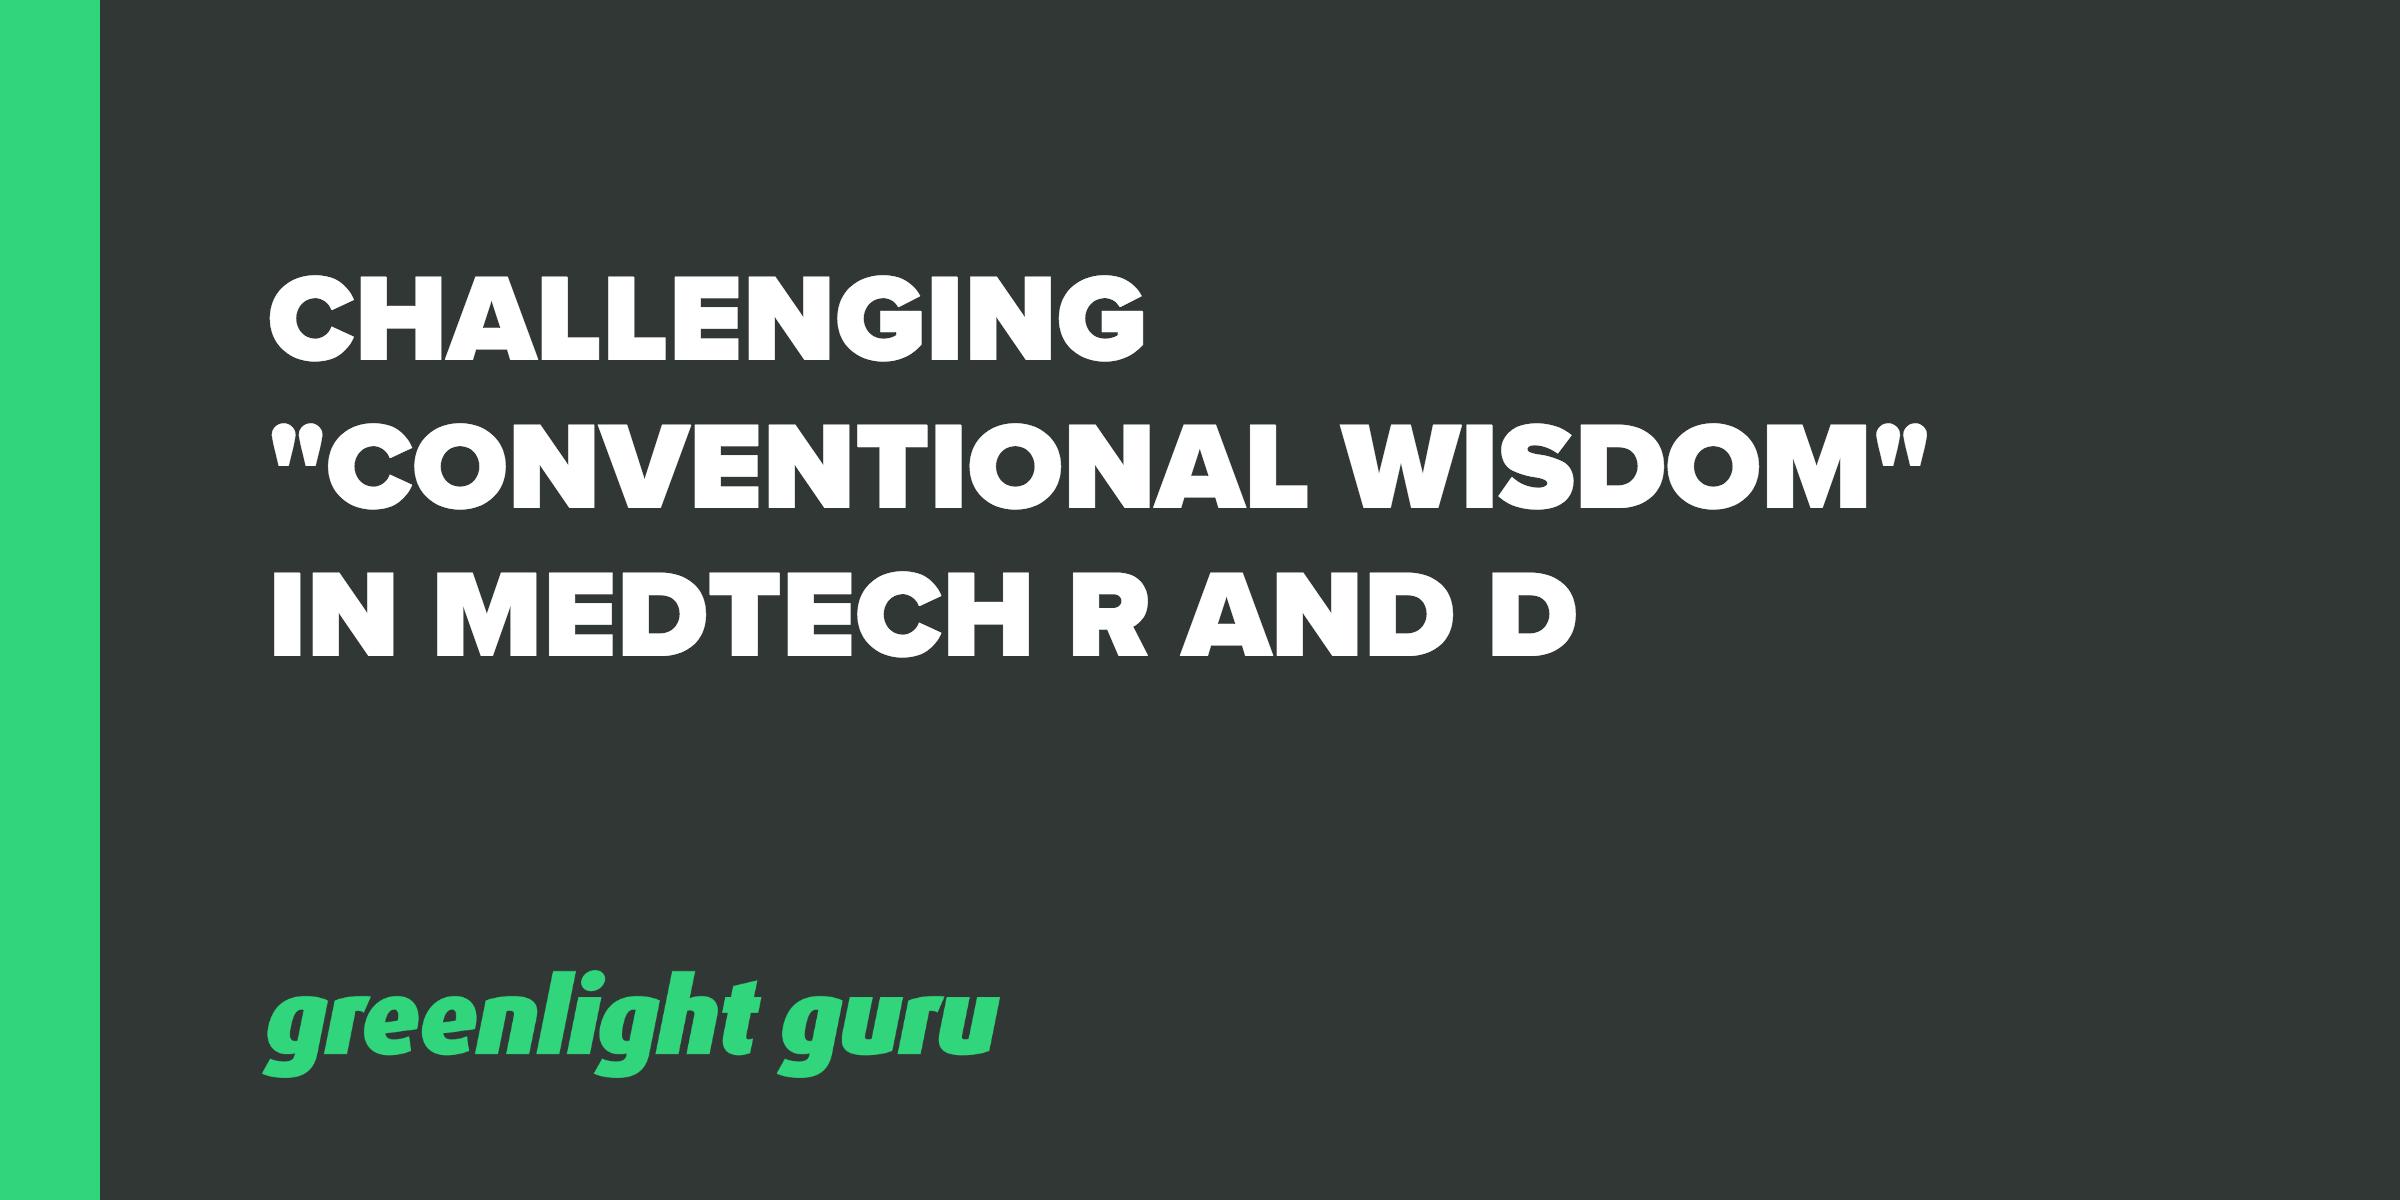 conventional-wisdom-medtech-r-and-d